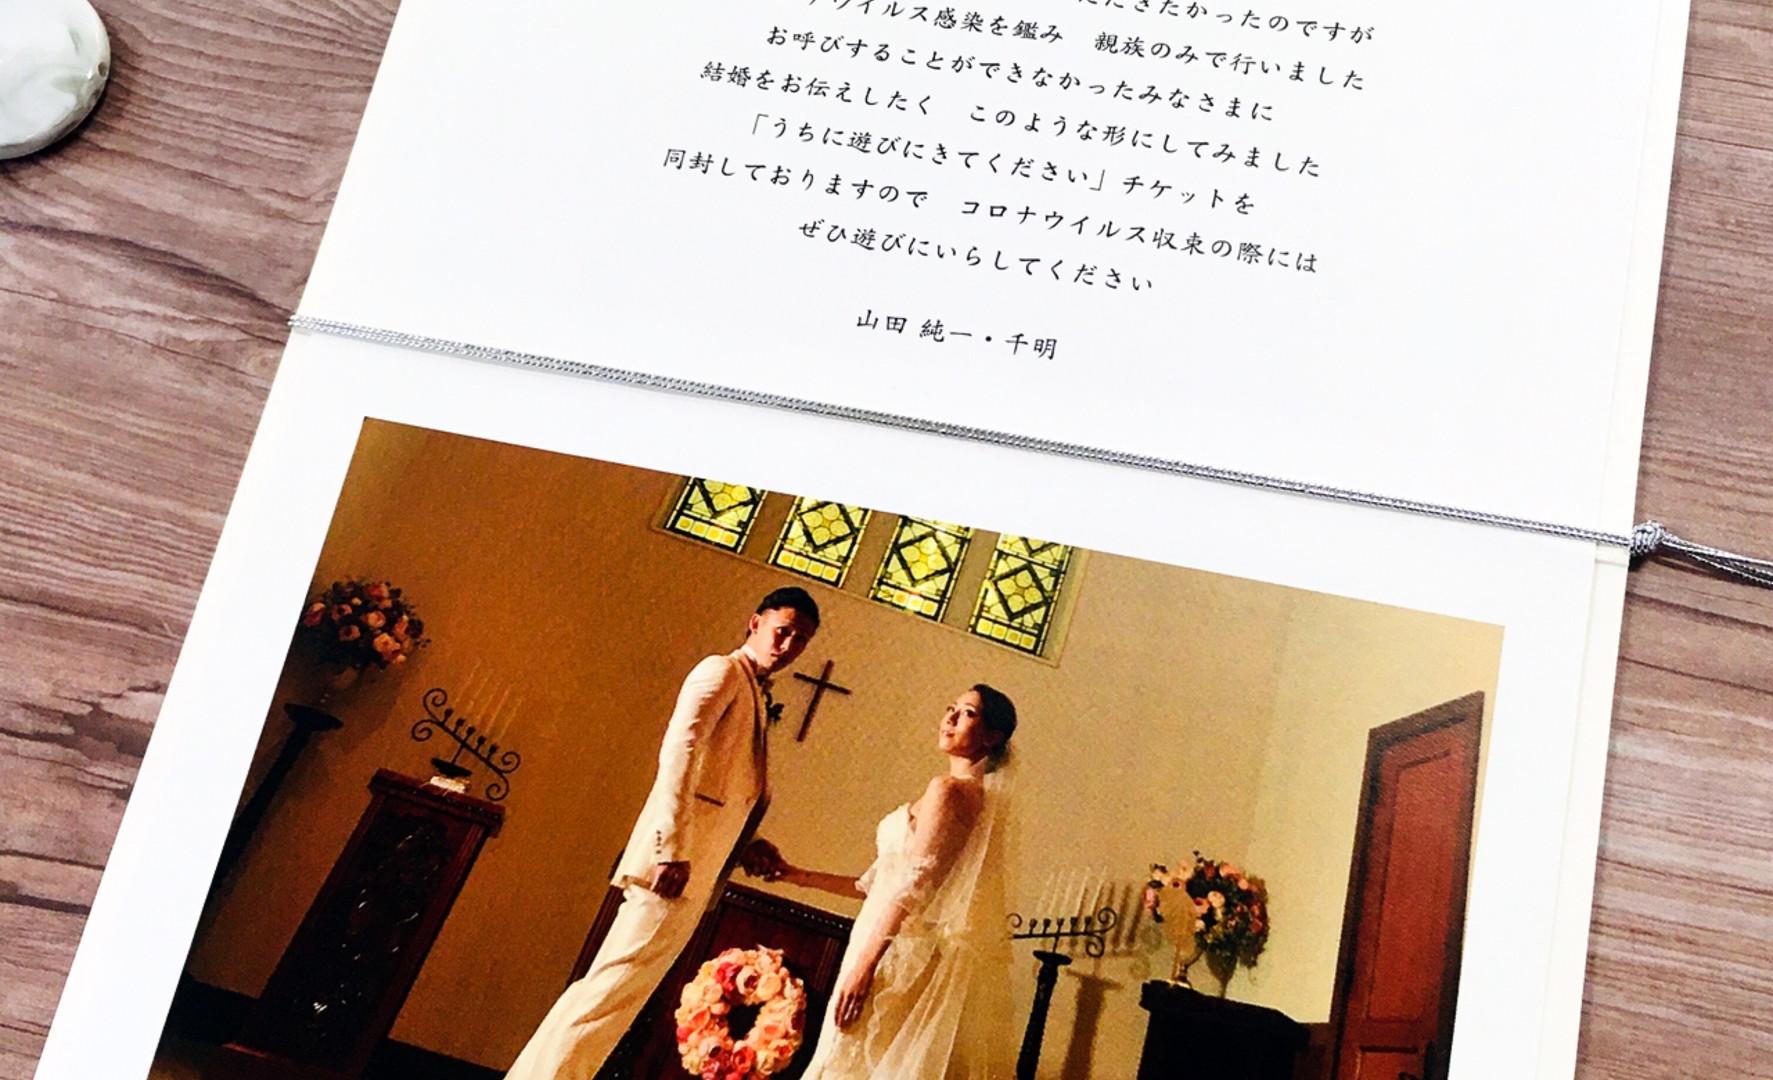 Just married デザイン9-B-4.jpg